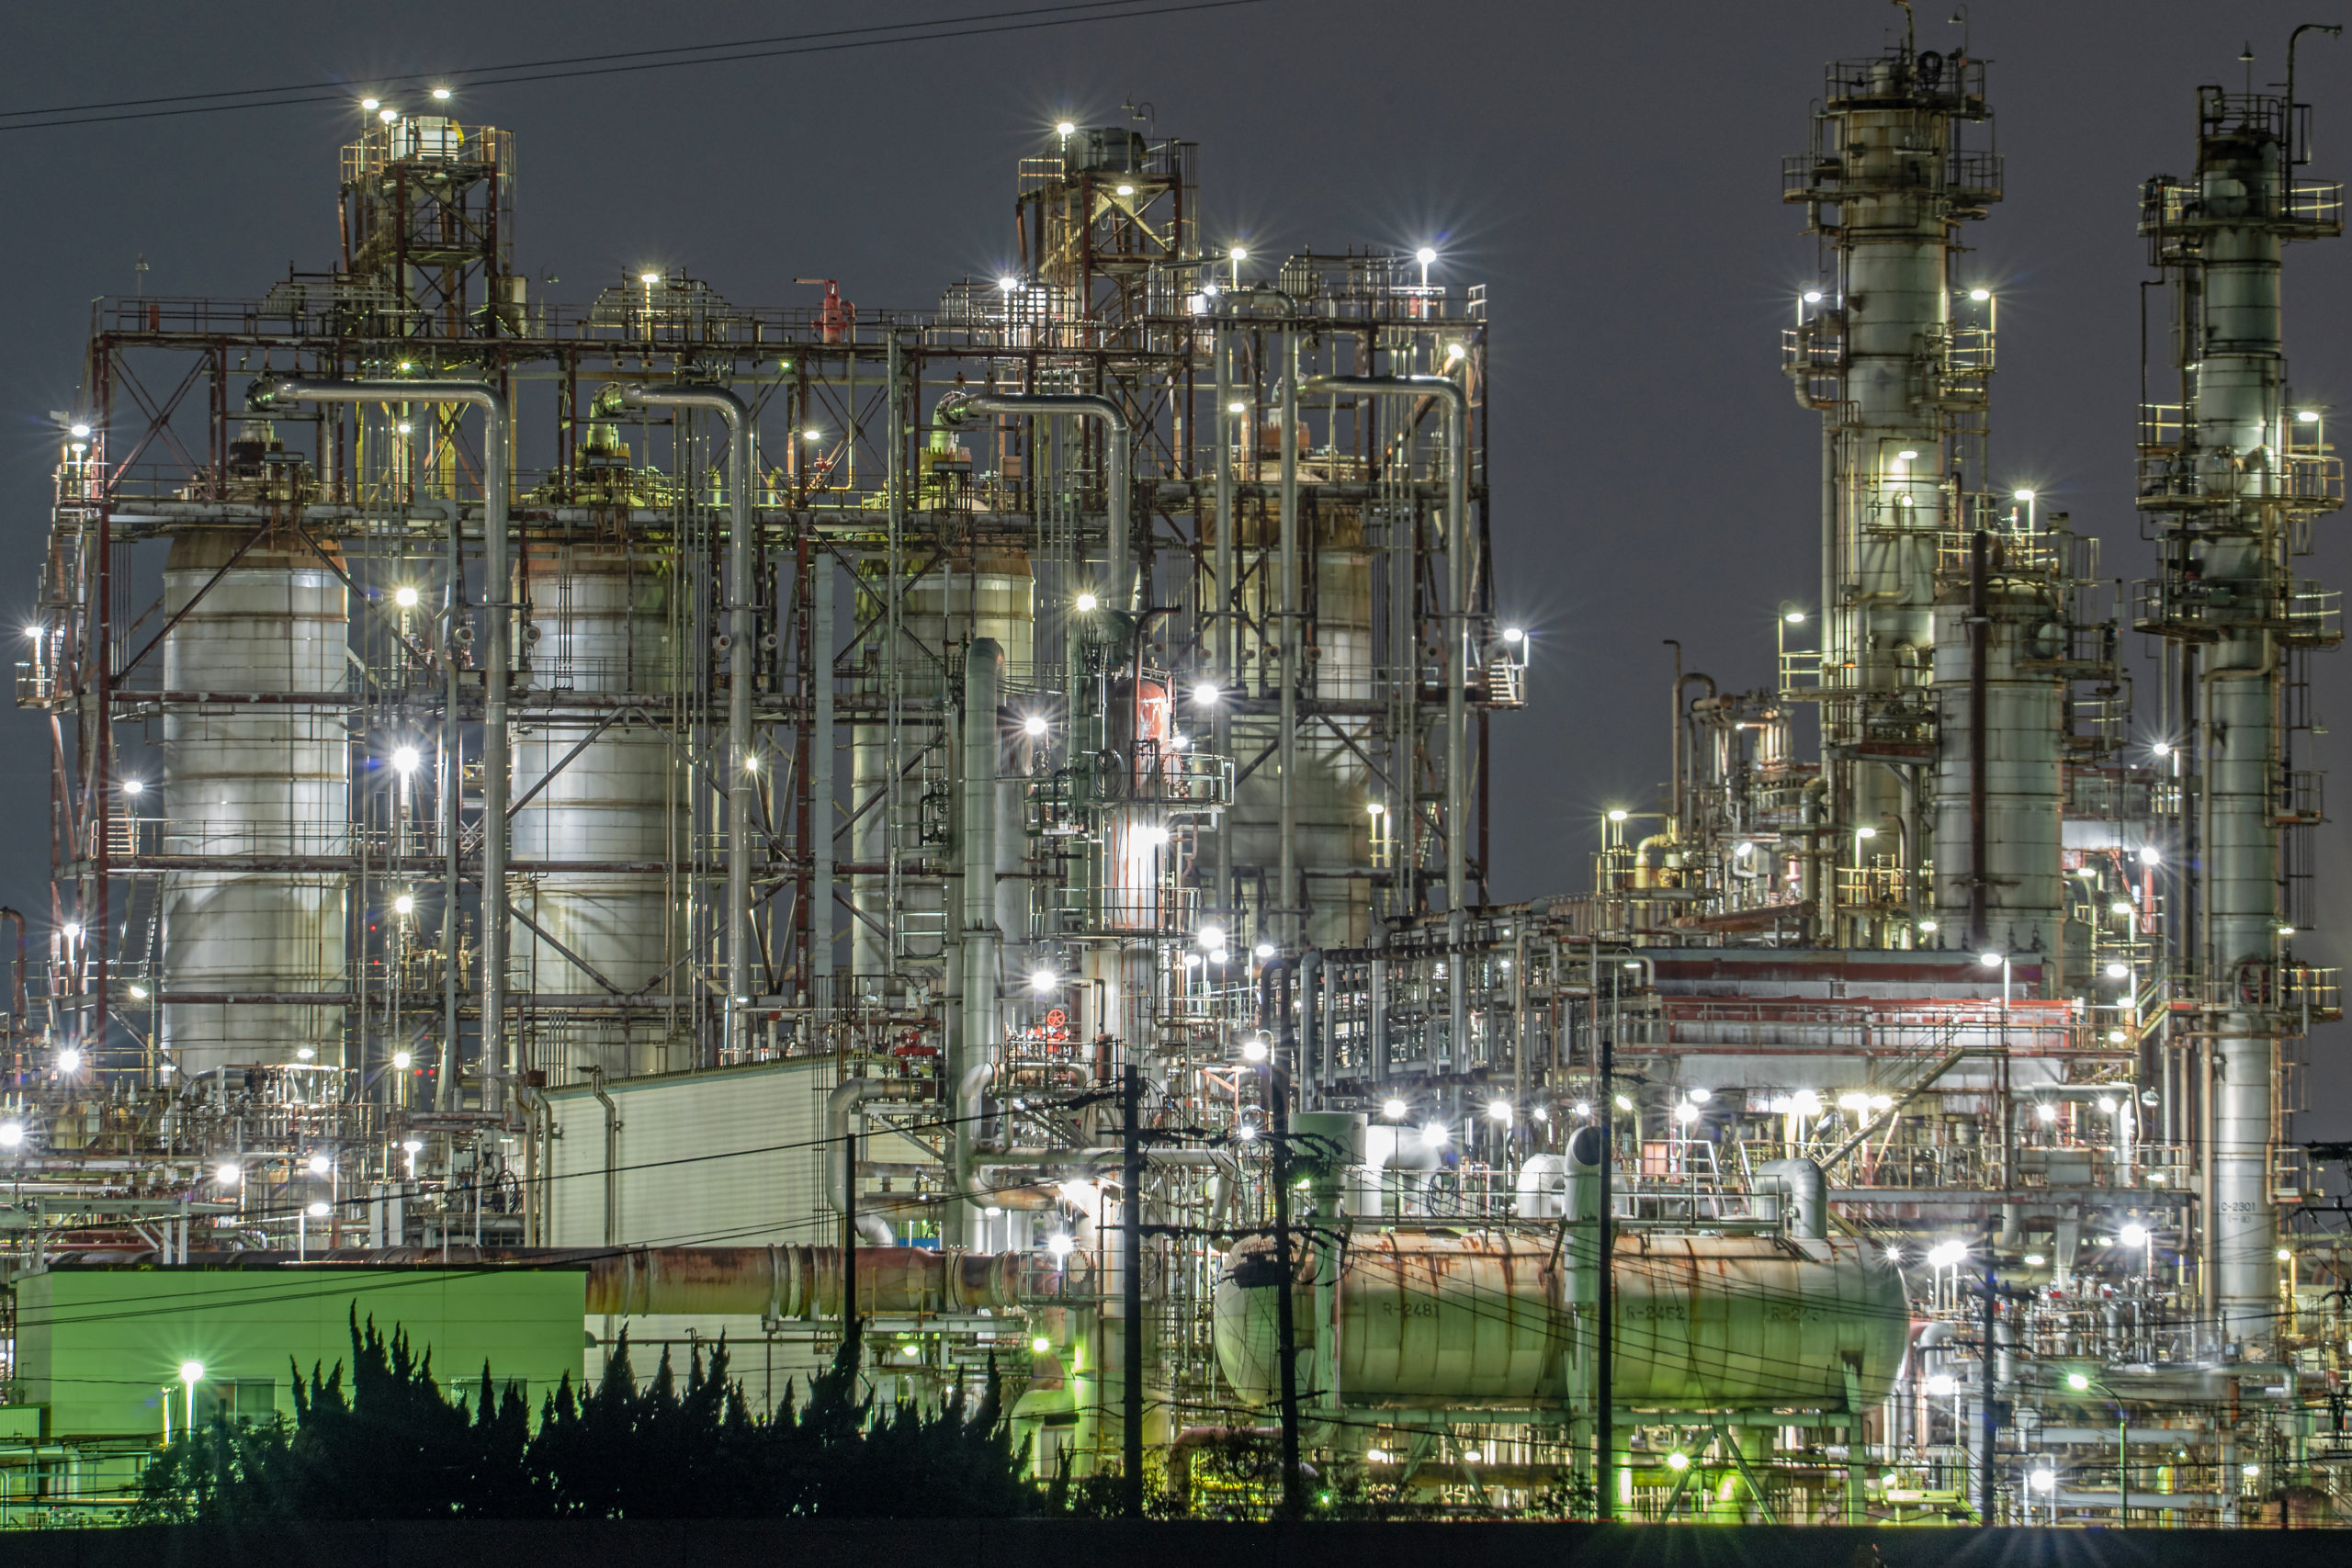 Yokkaichi Shiohama area Factory night view